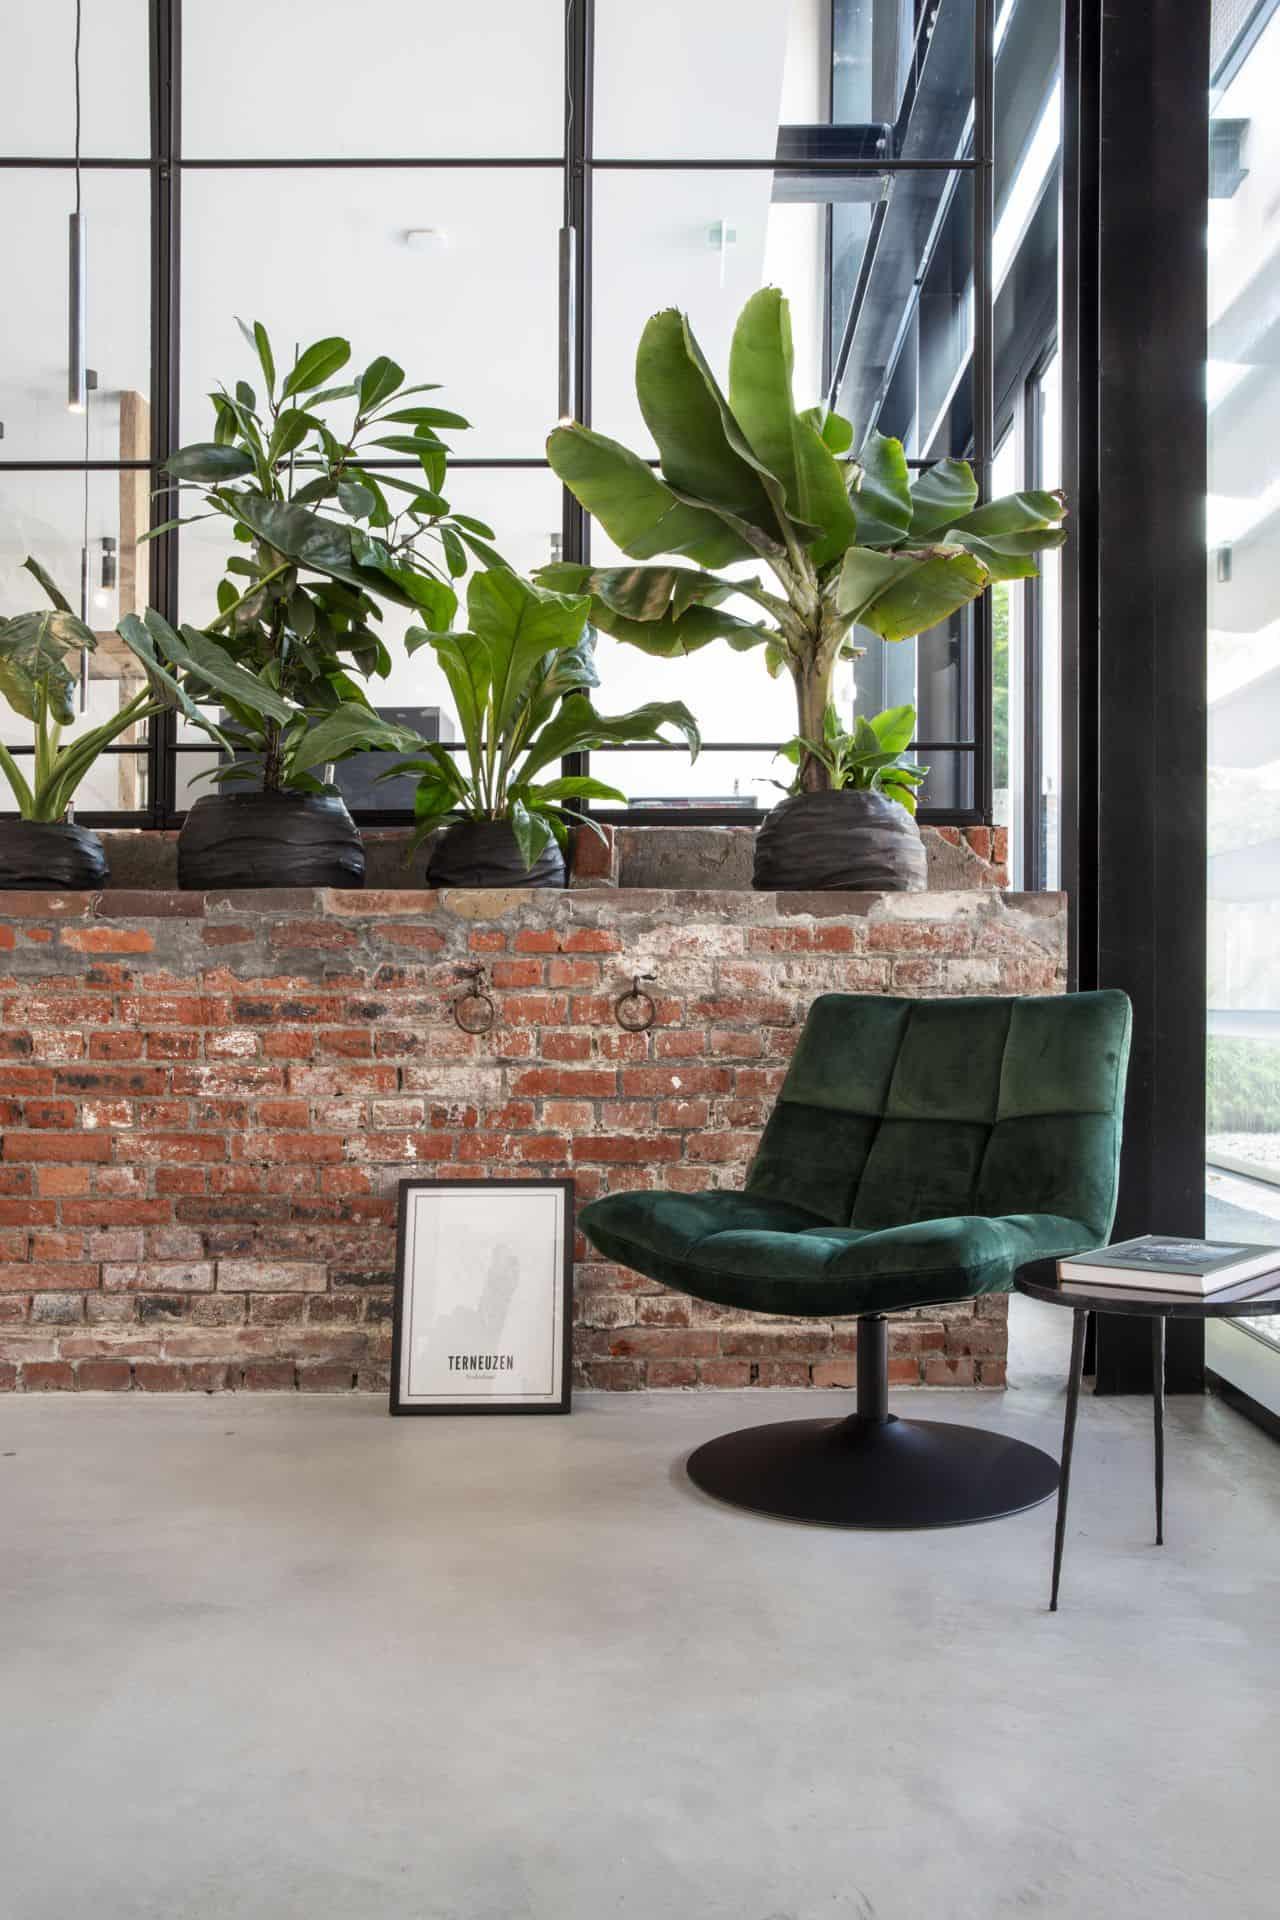 gevlinderde betonvloer, gevlinderd beton